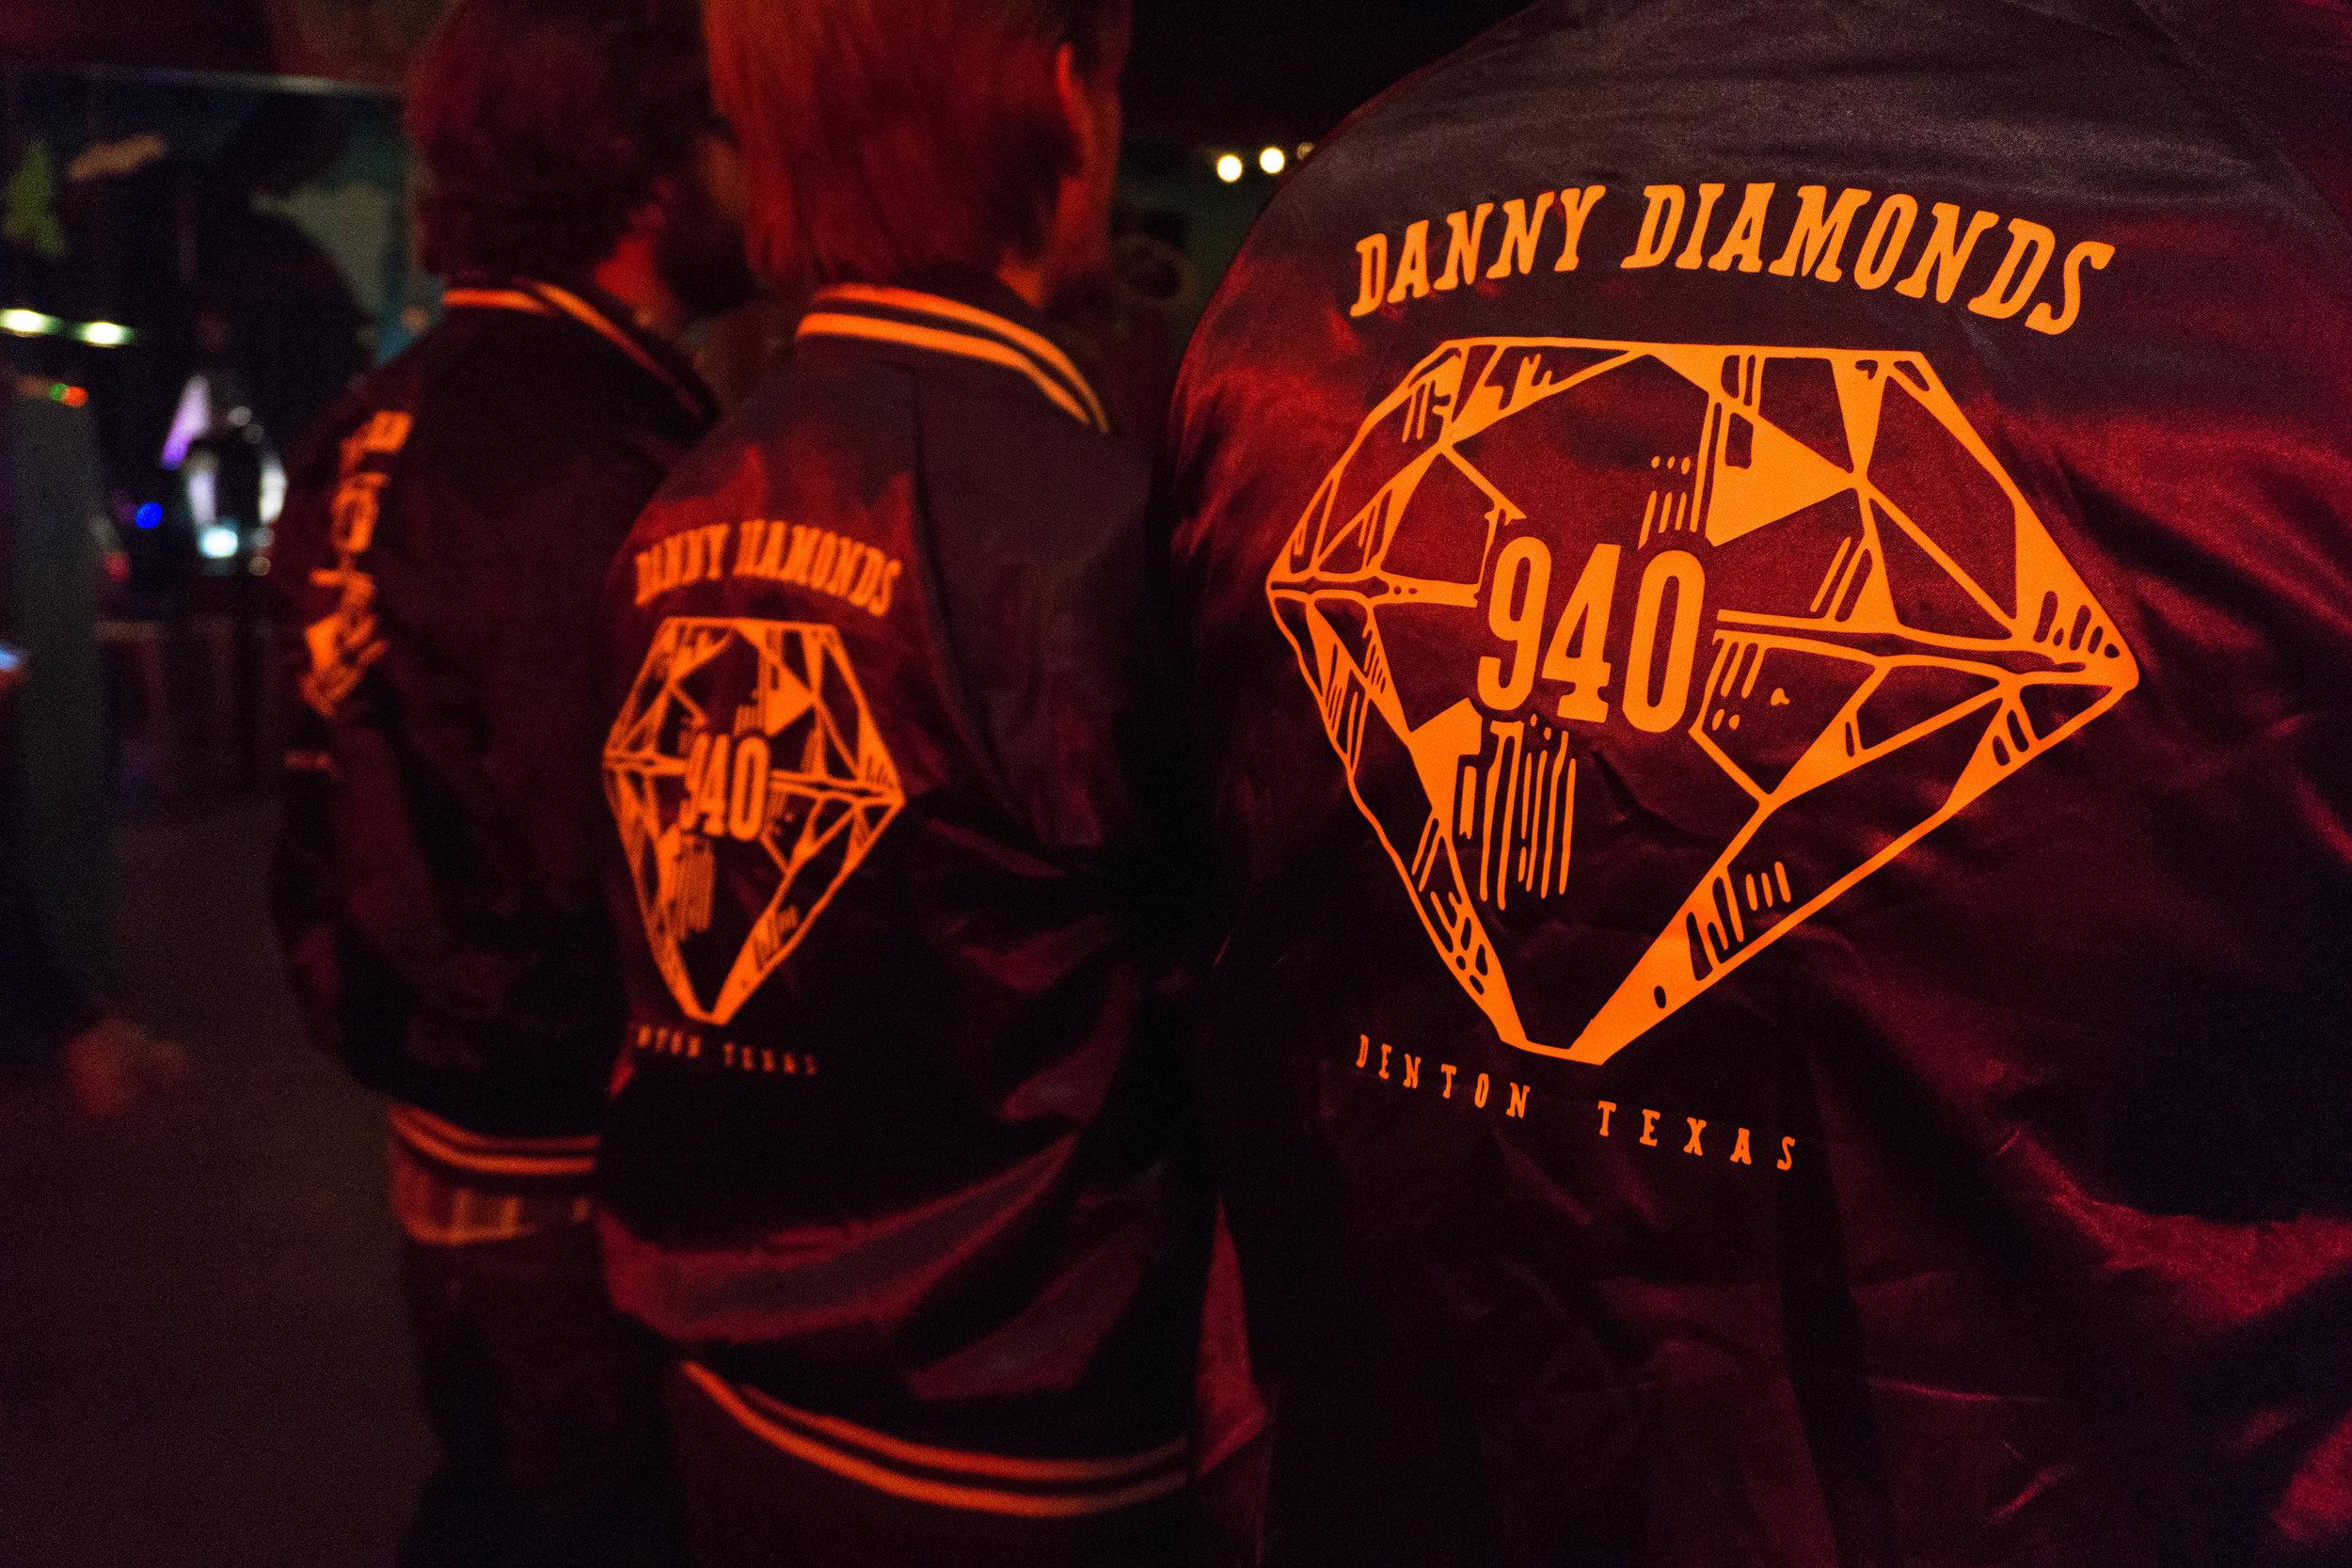 Copy of 3.2.17 Danny Diamonds - Dans Silverleaf (12 of 57).jpg